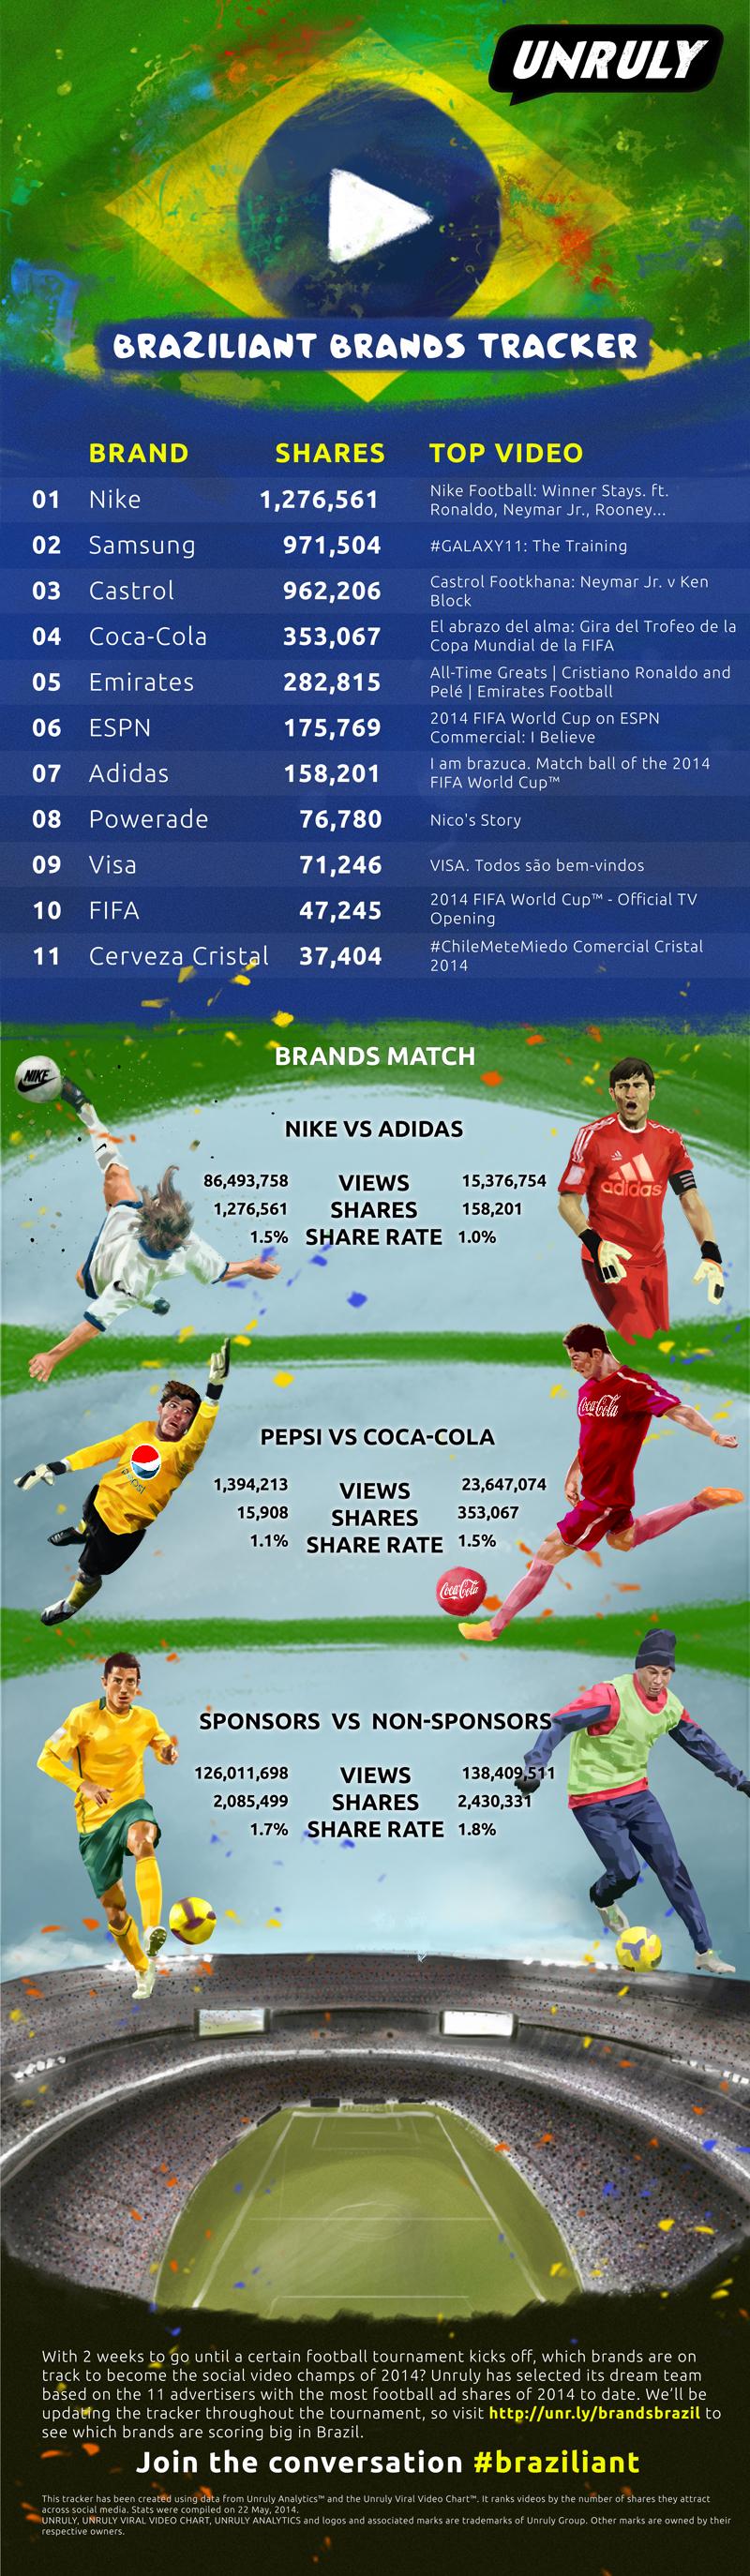 Unruly_Braziliant_Brands_Tracker_2014